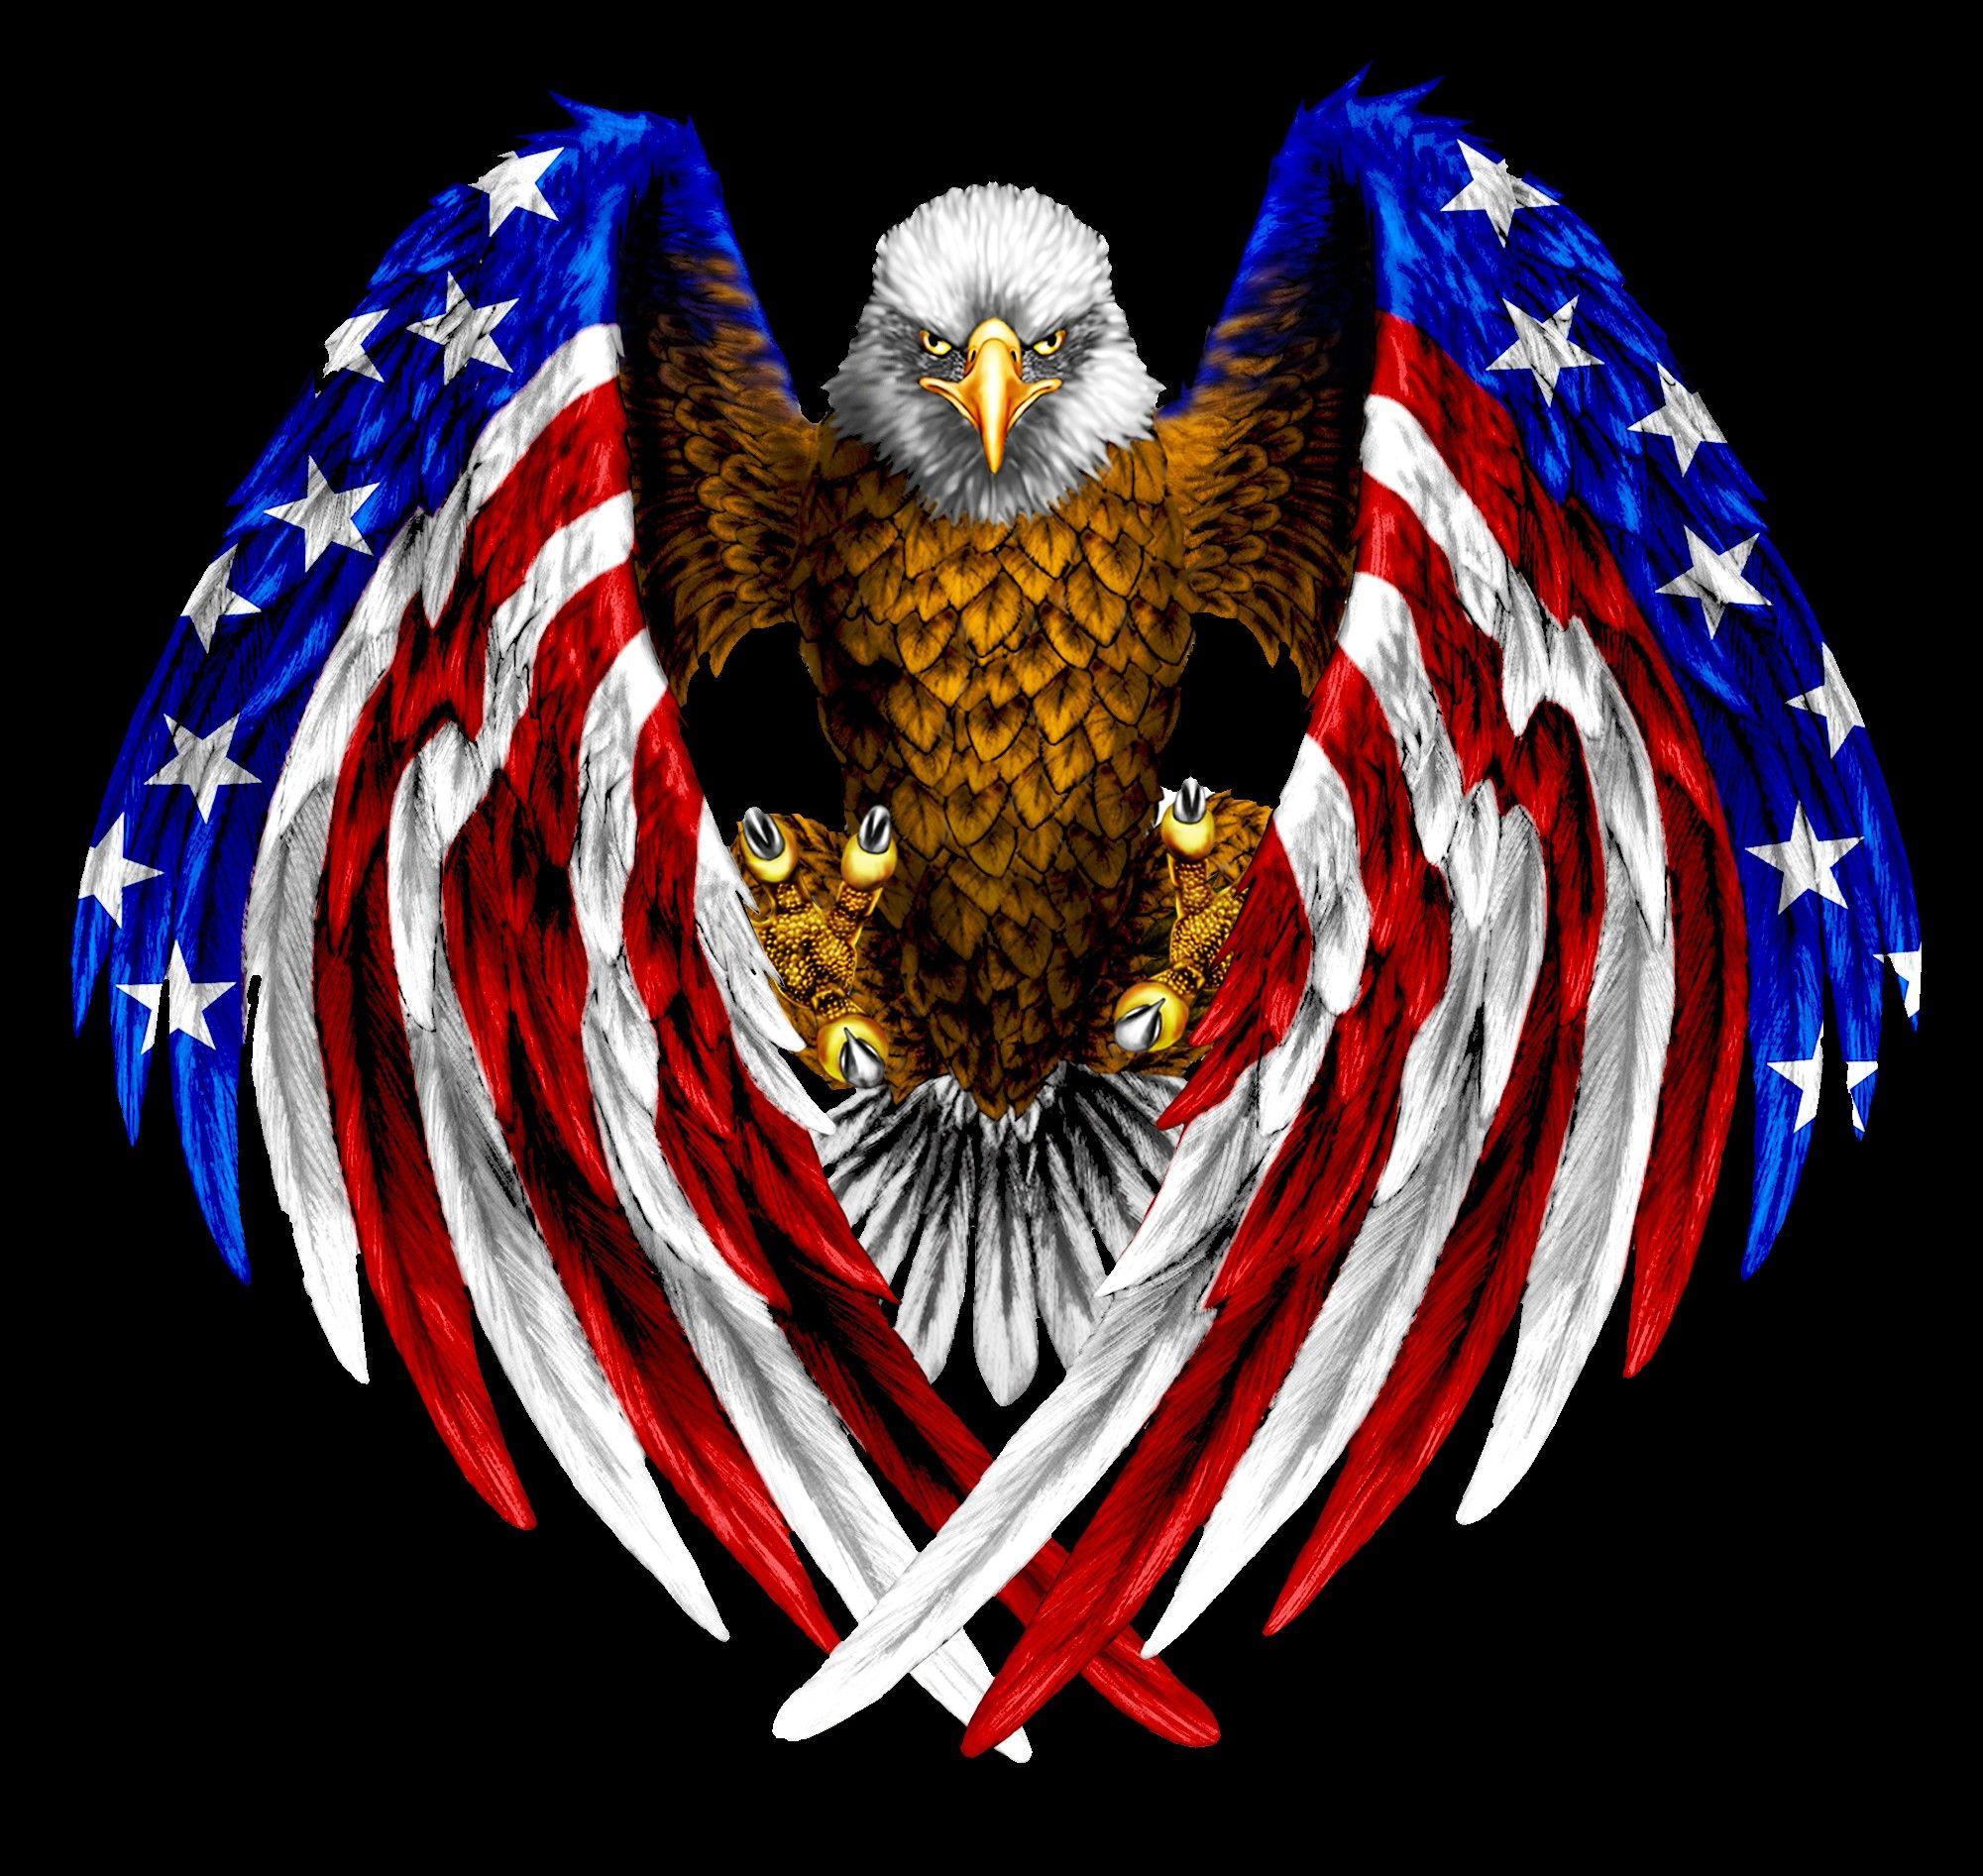 Usa flag eagle. Image result for clipart